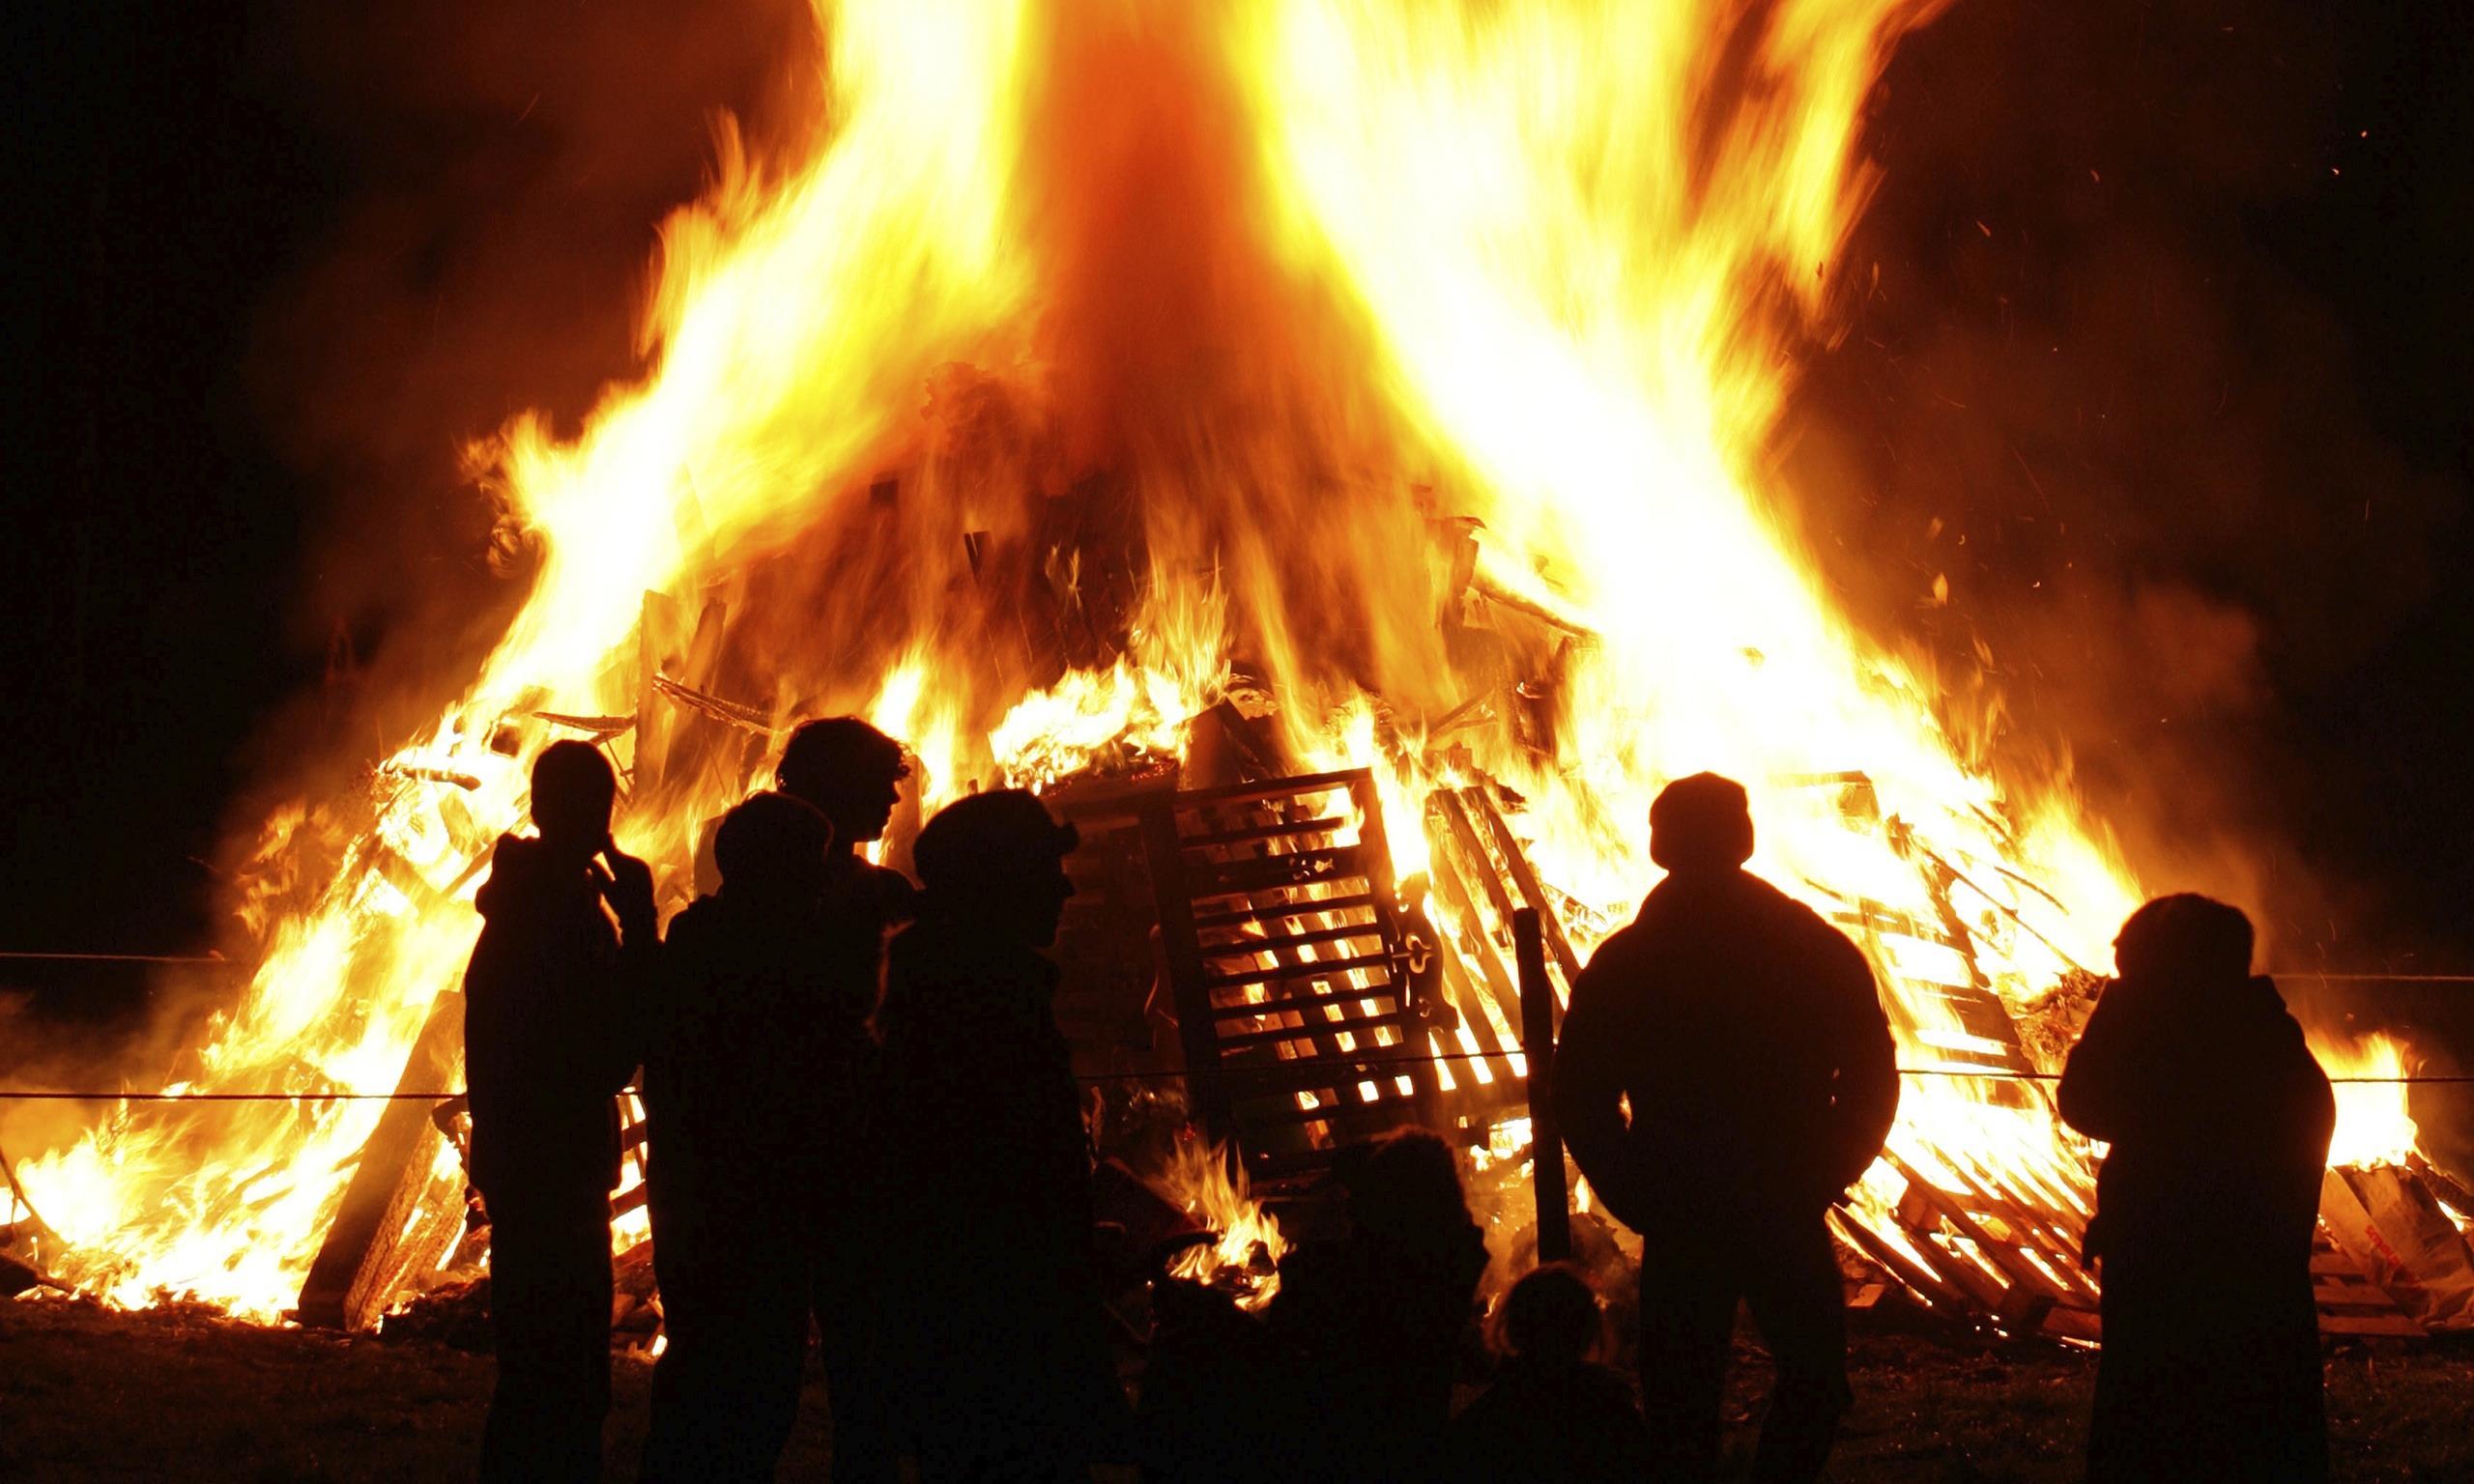 Free Bonfire Invitations is good invitations example